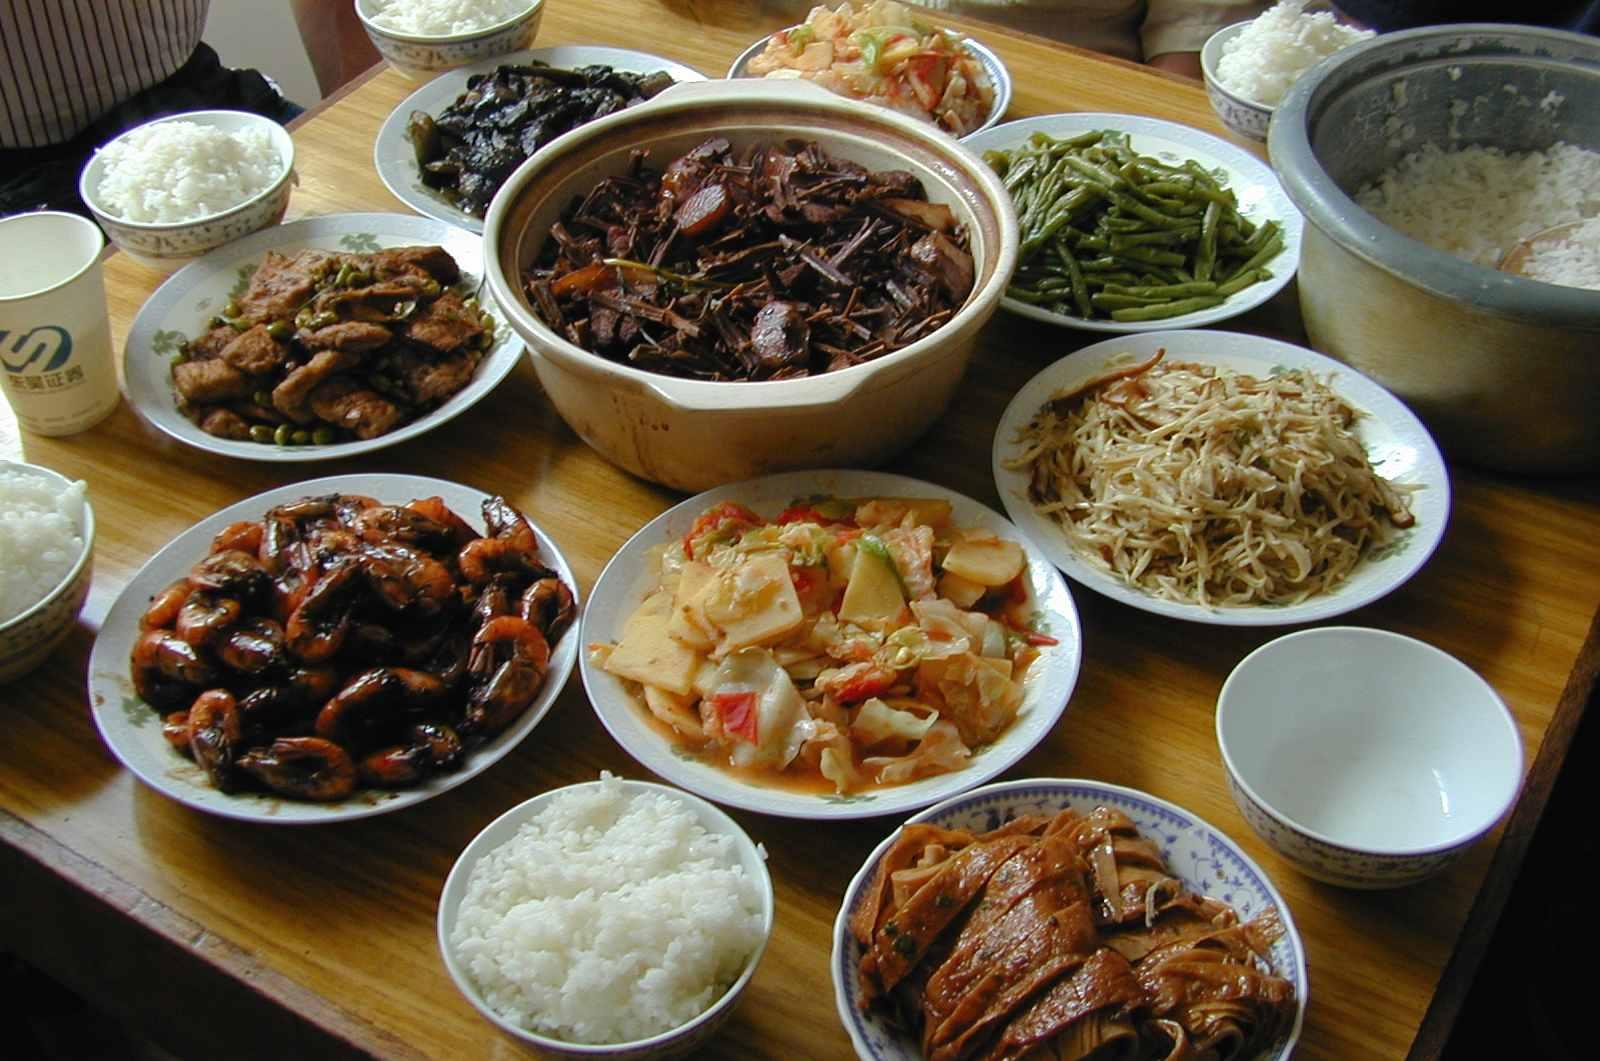 Visit Suzhou - Amazing China Travel Destination